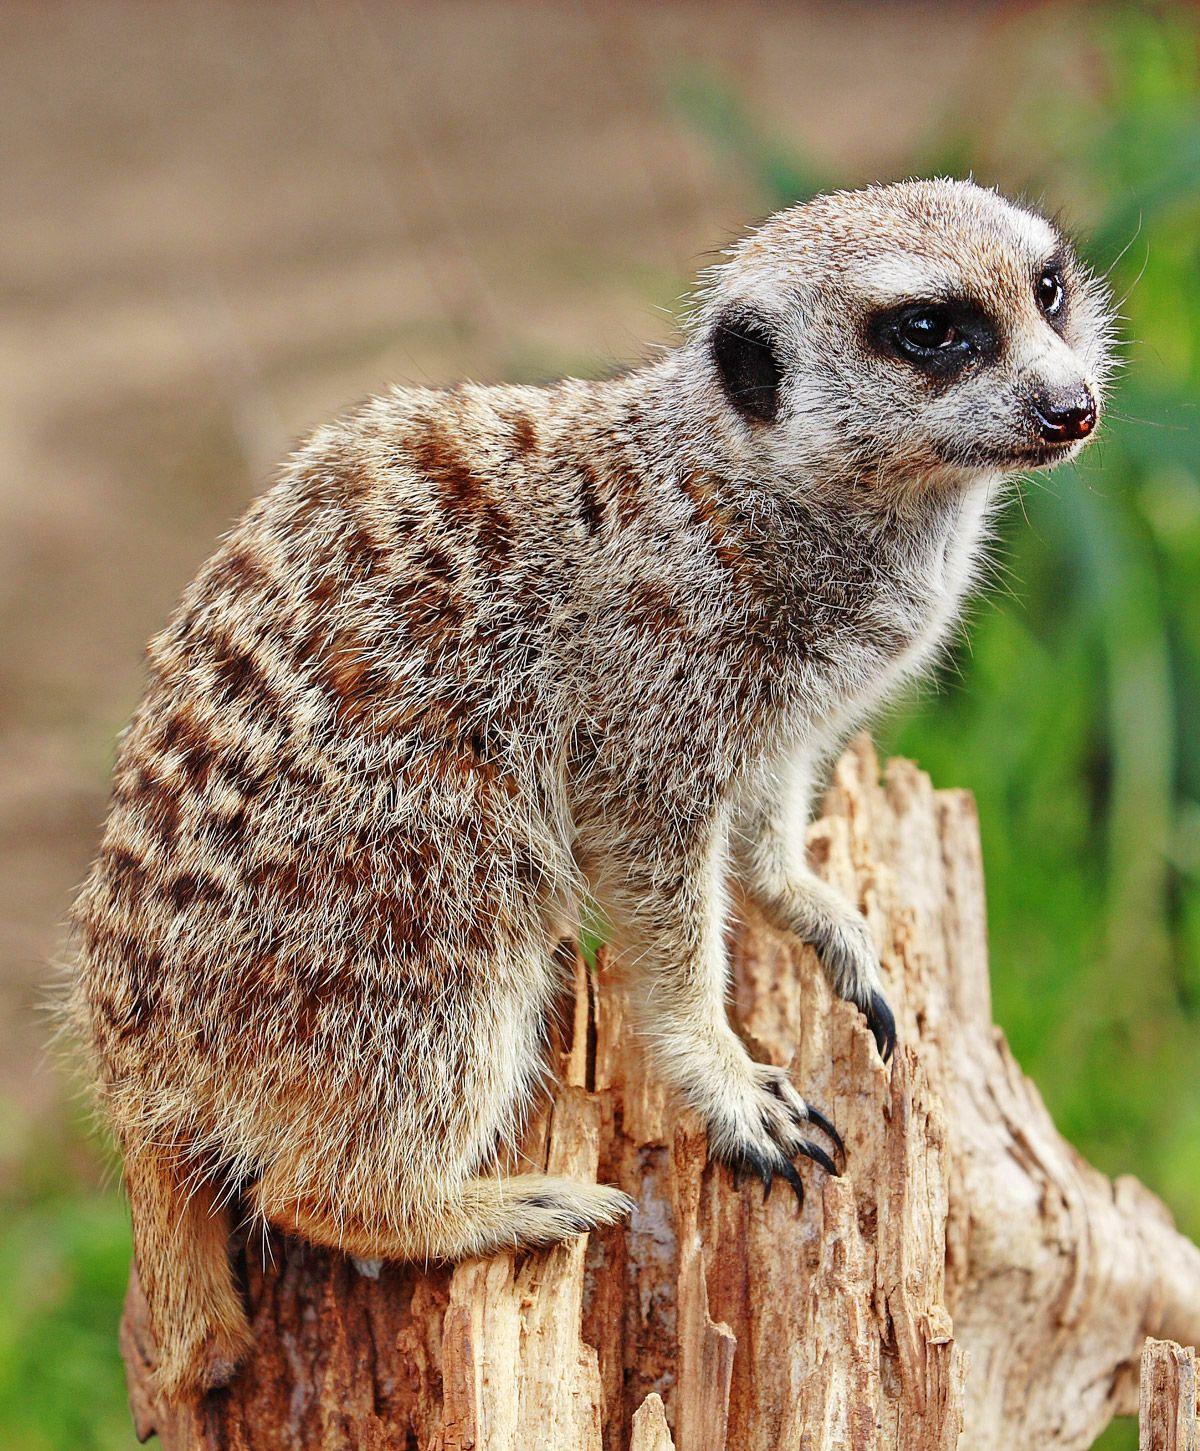 Meerkat Simple English Wikipedia, the free encyclopedia